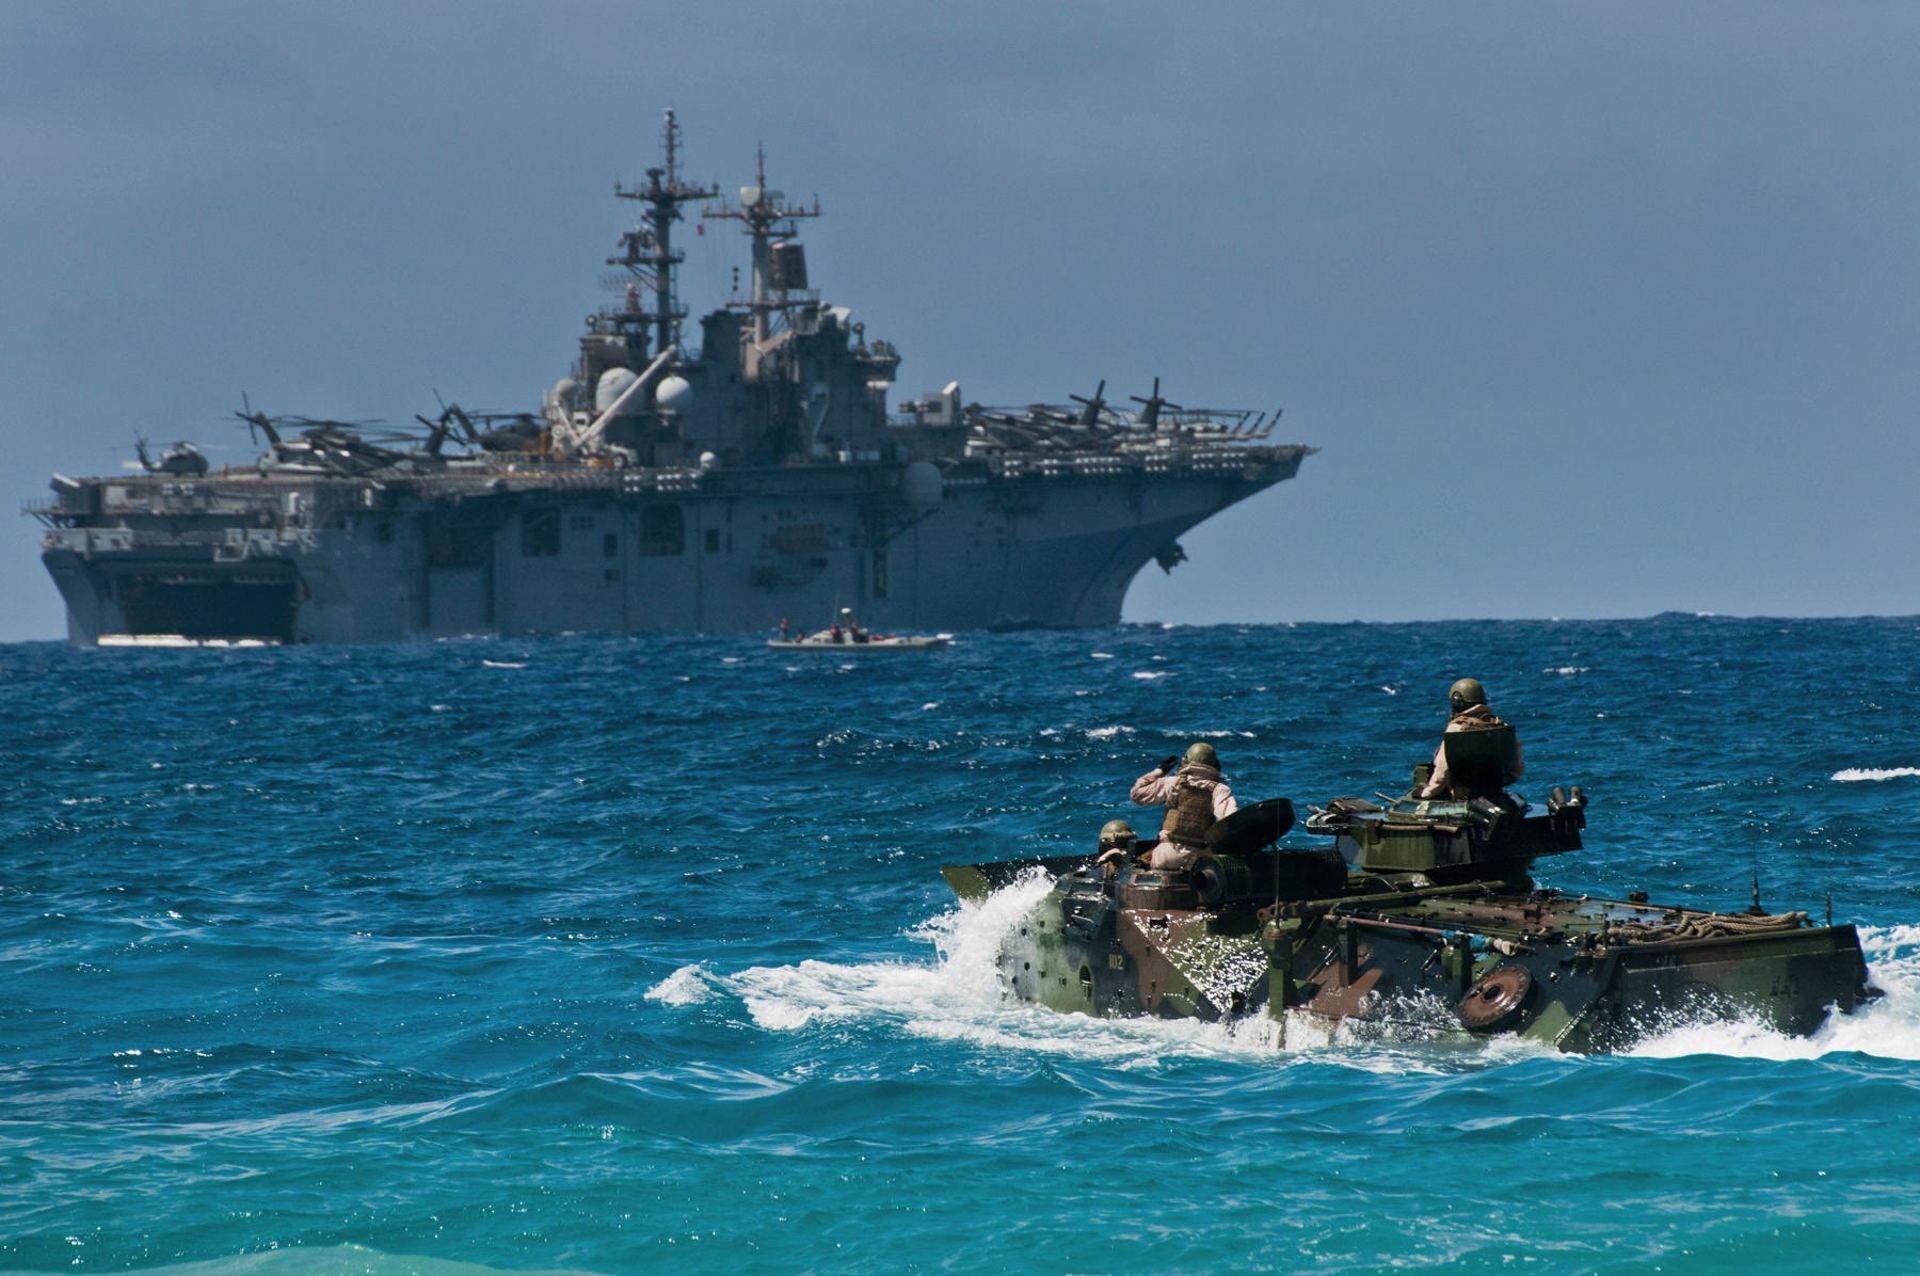 The Naval Alliance: Preparing NATO for a Maritime Century